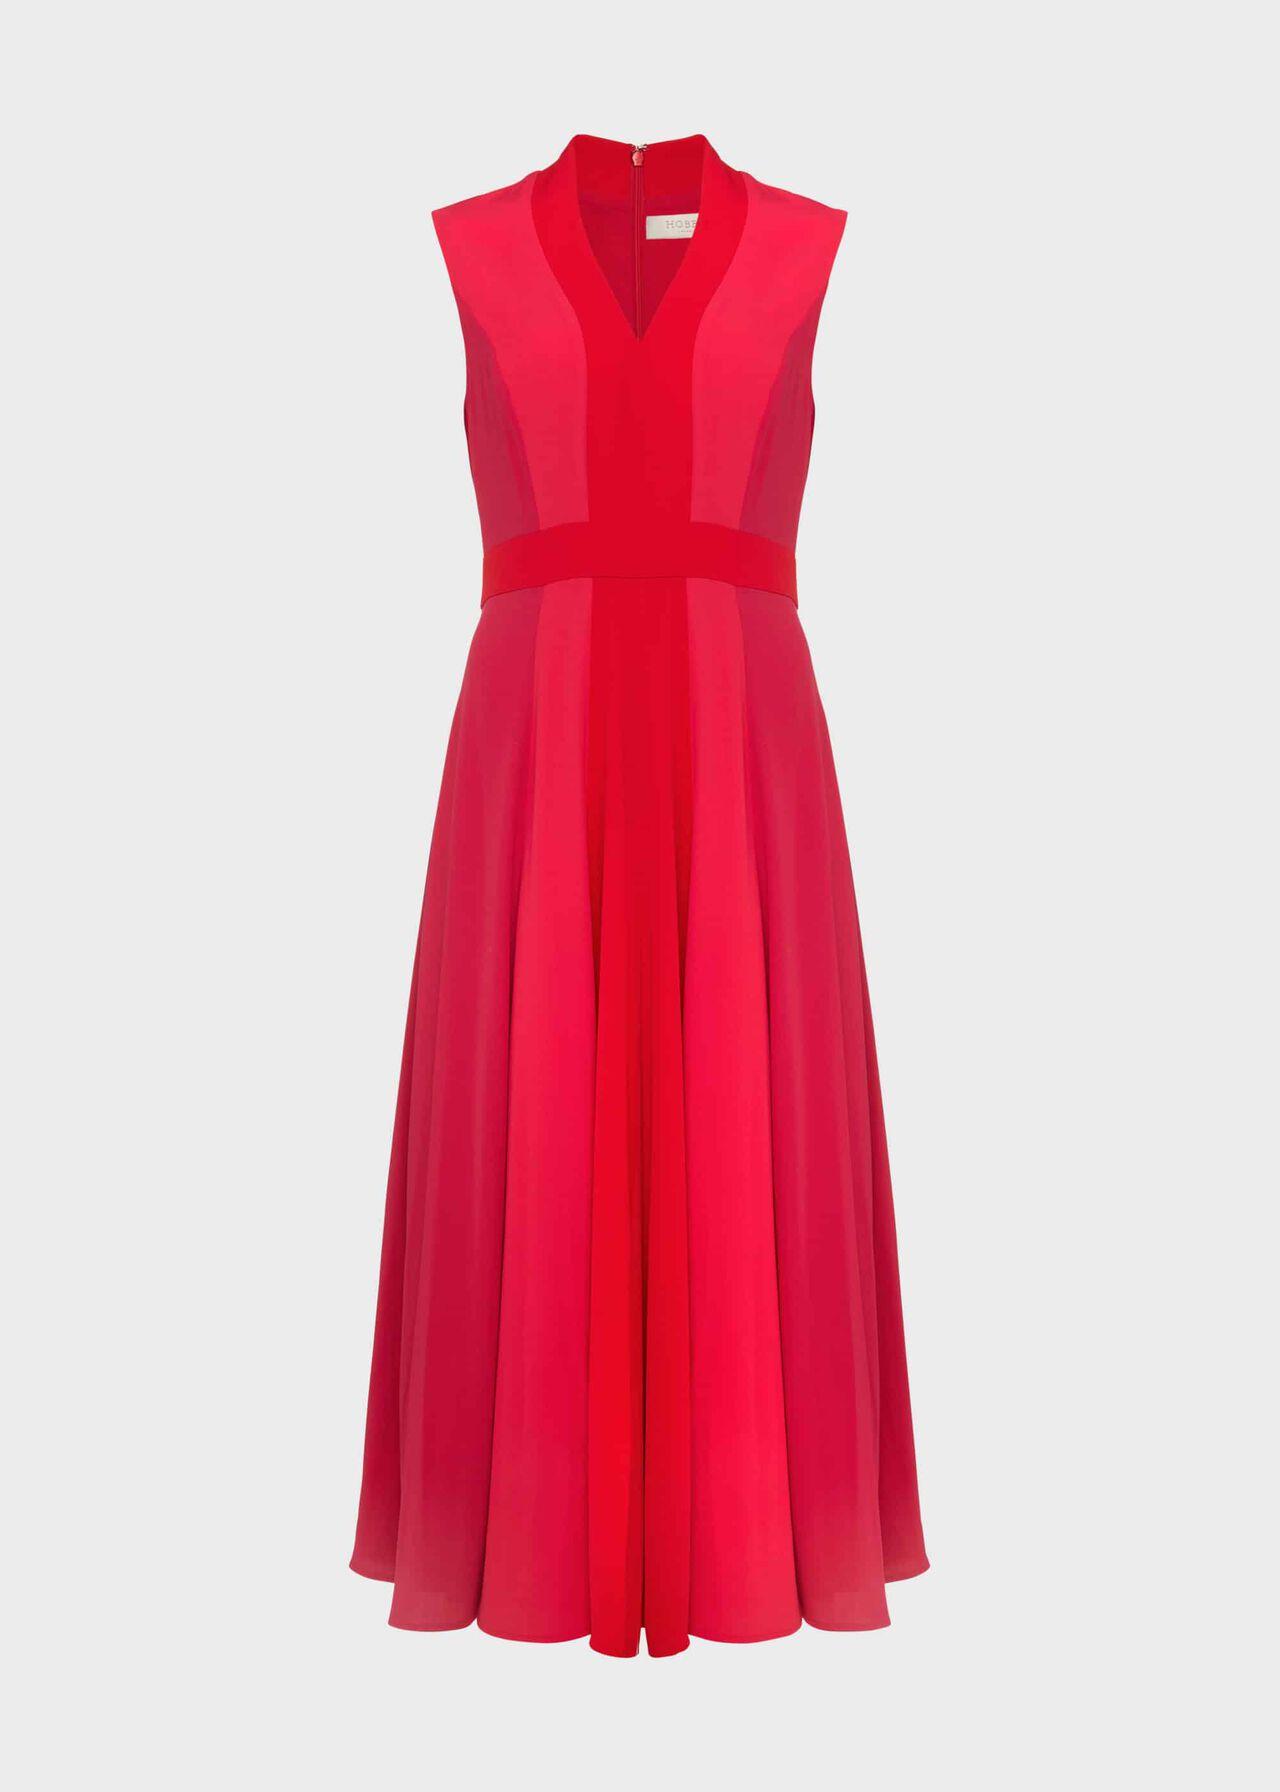 Jilly Colourblock V Neck Dress Raspberry Red